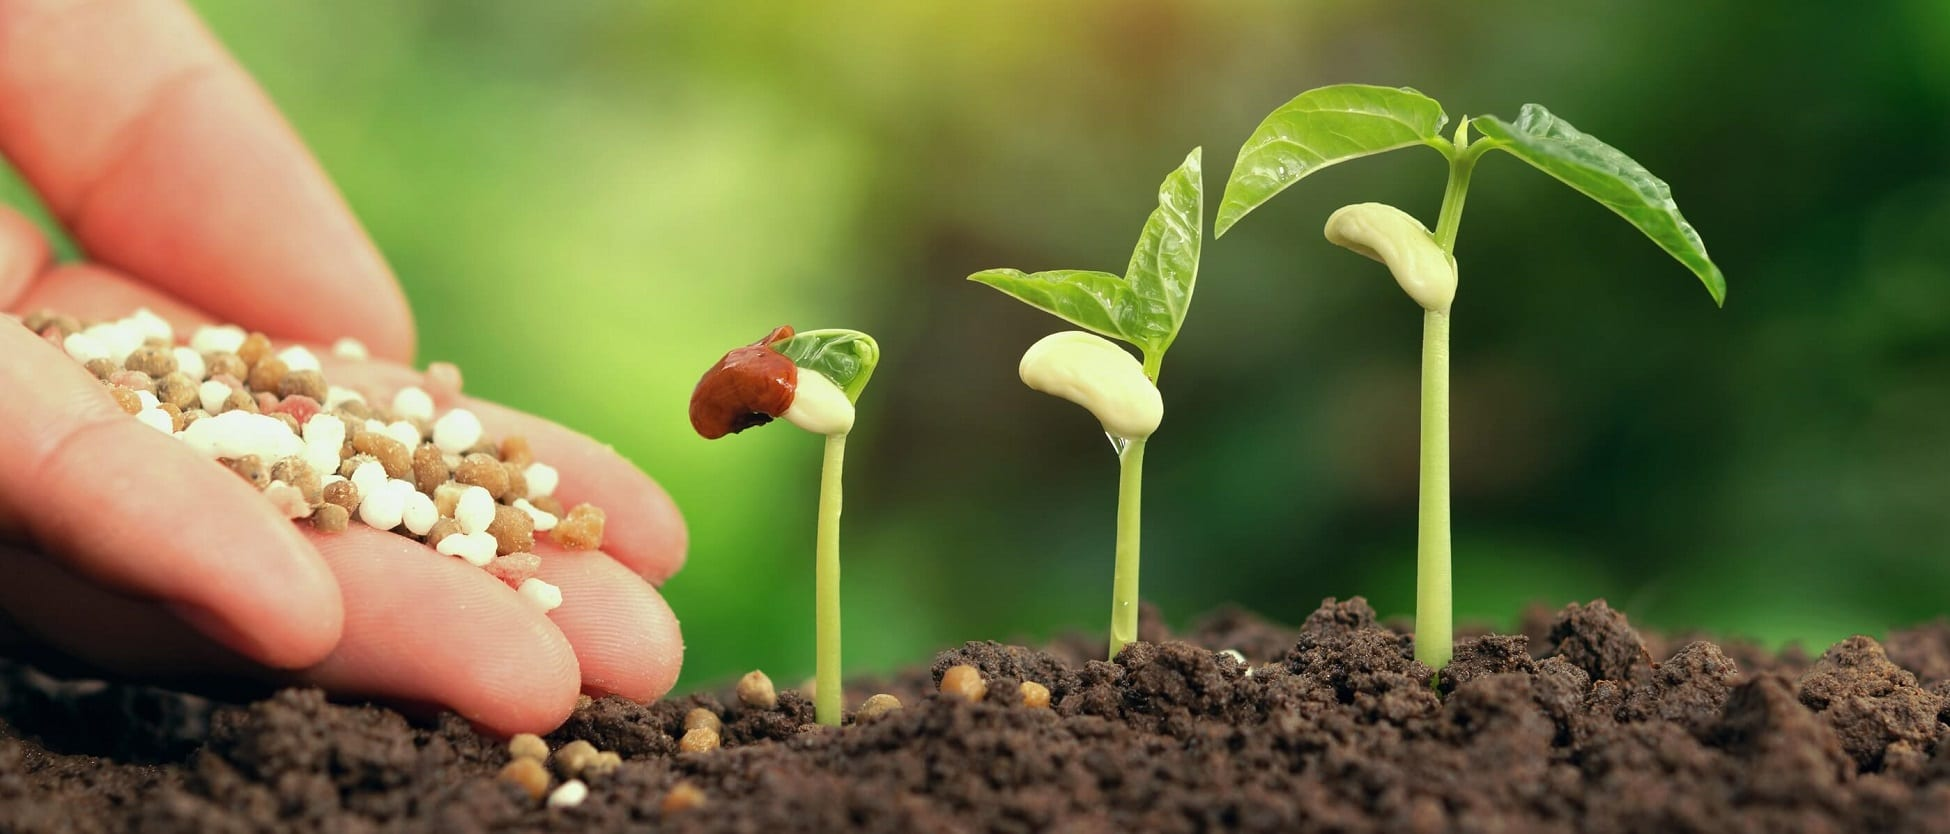 Nurturing plants, growing